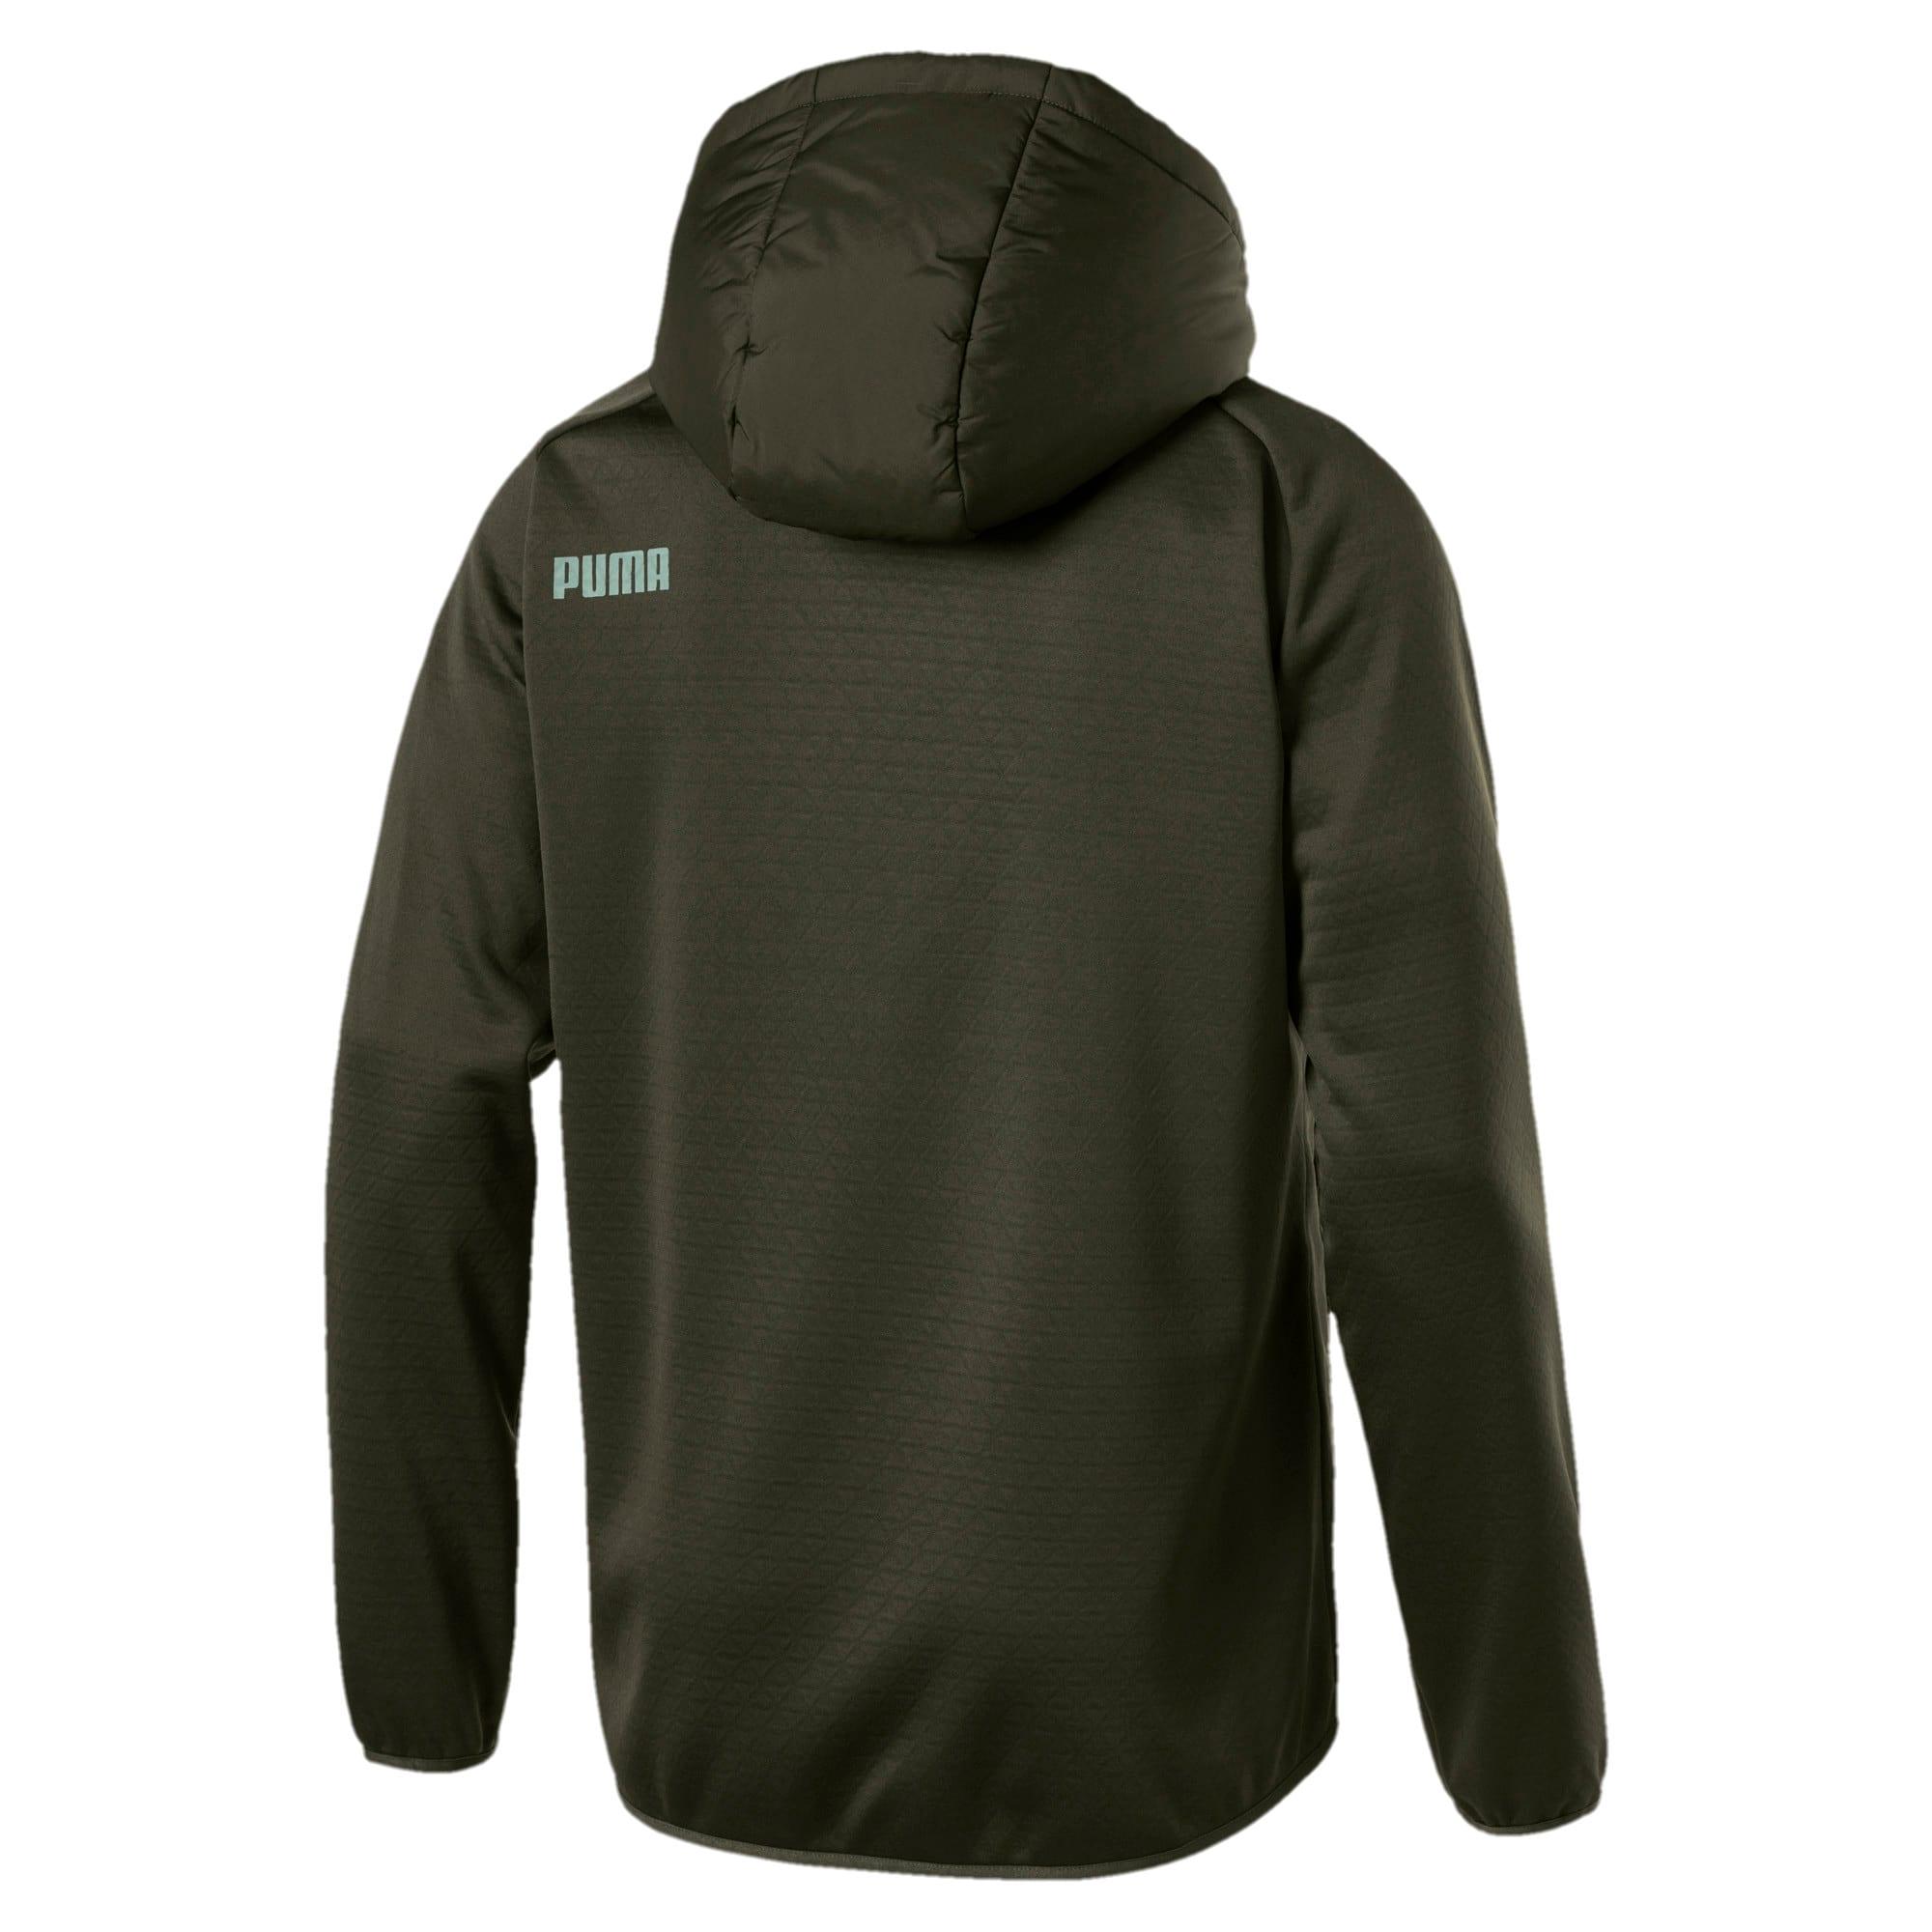 Thumbnail 3 of Hybrid Men's Padded Jacket, Forest Night, medium